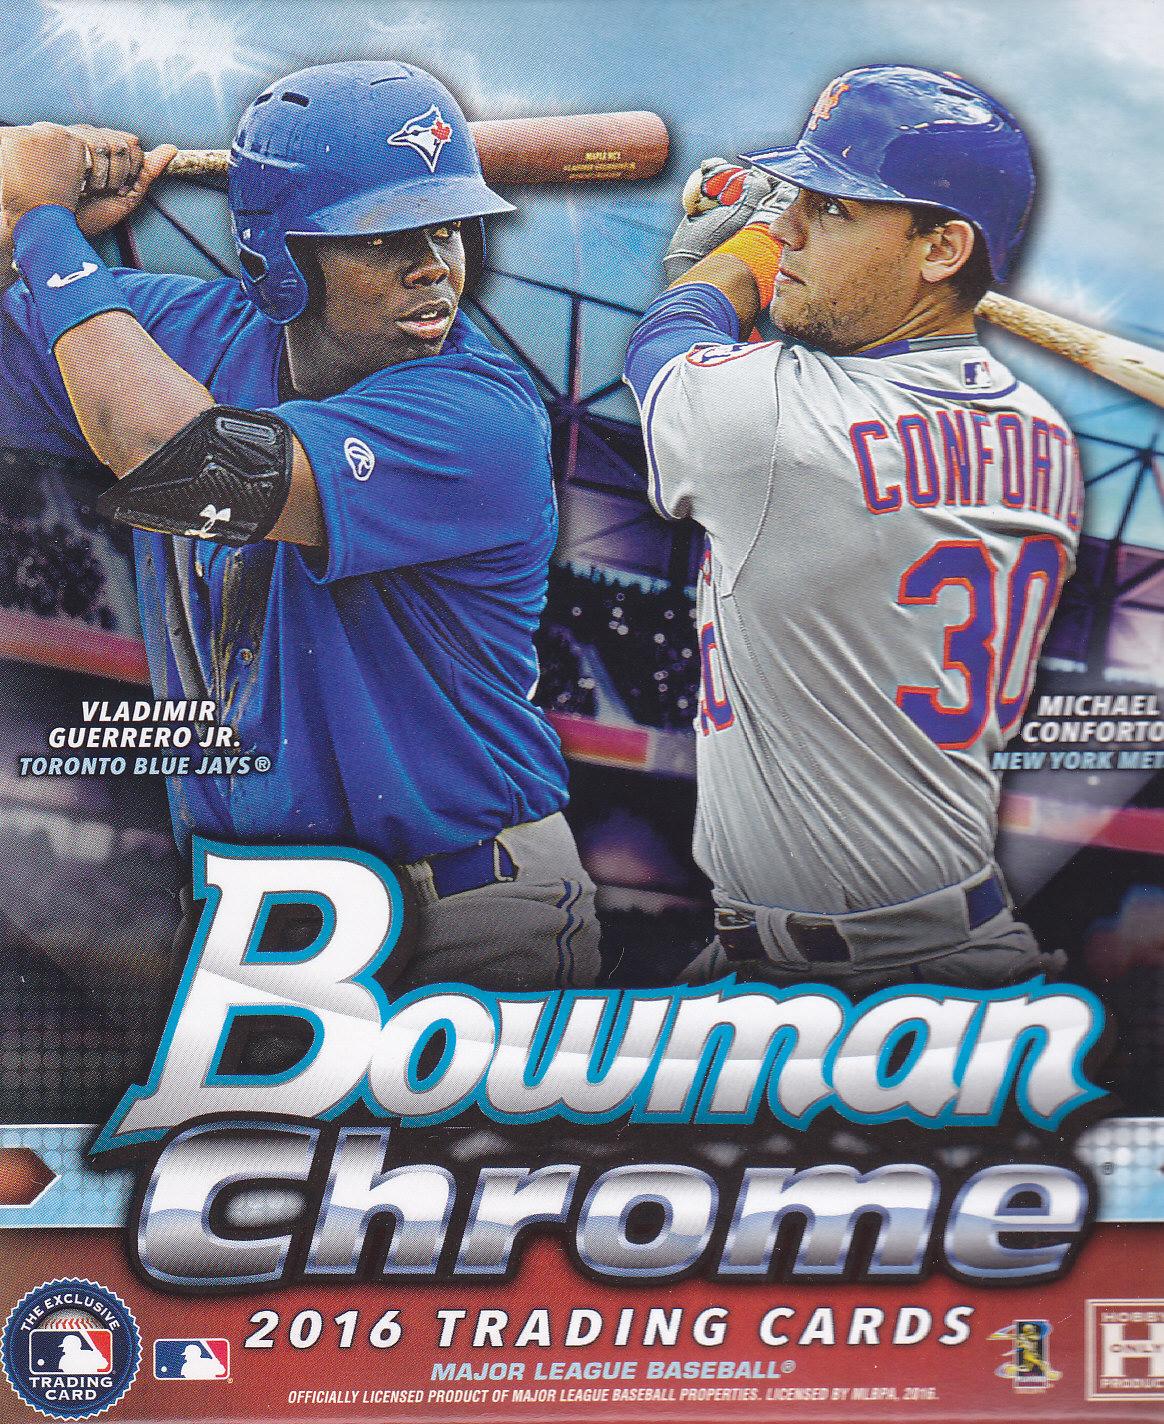 2016 Bowman Chrome Gives A Fresh Look At A September